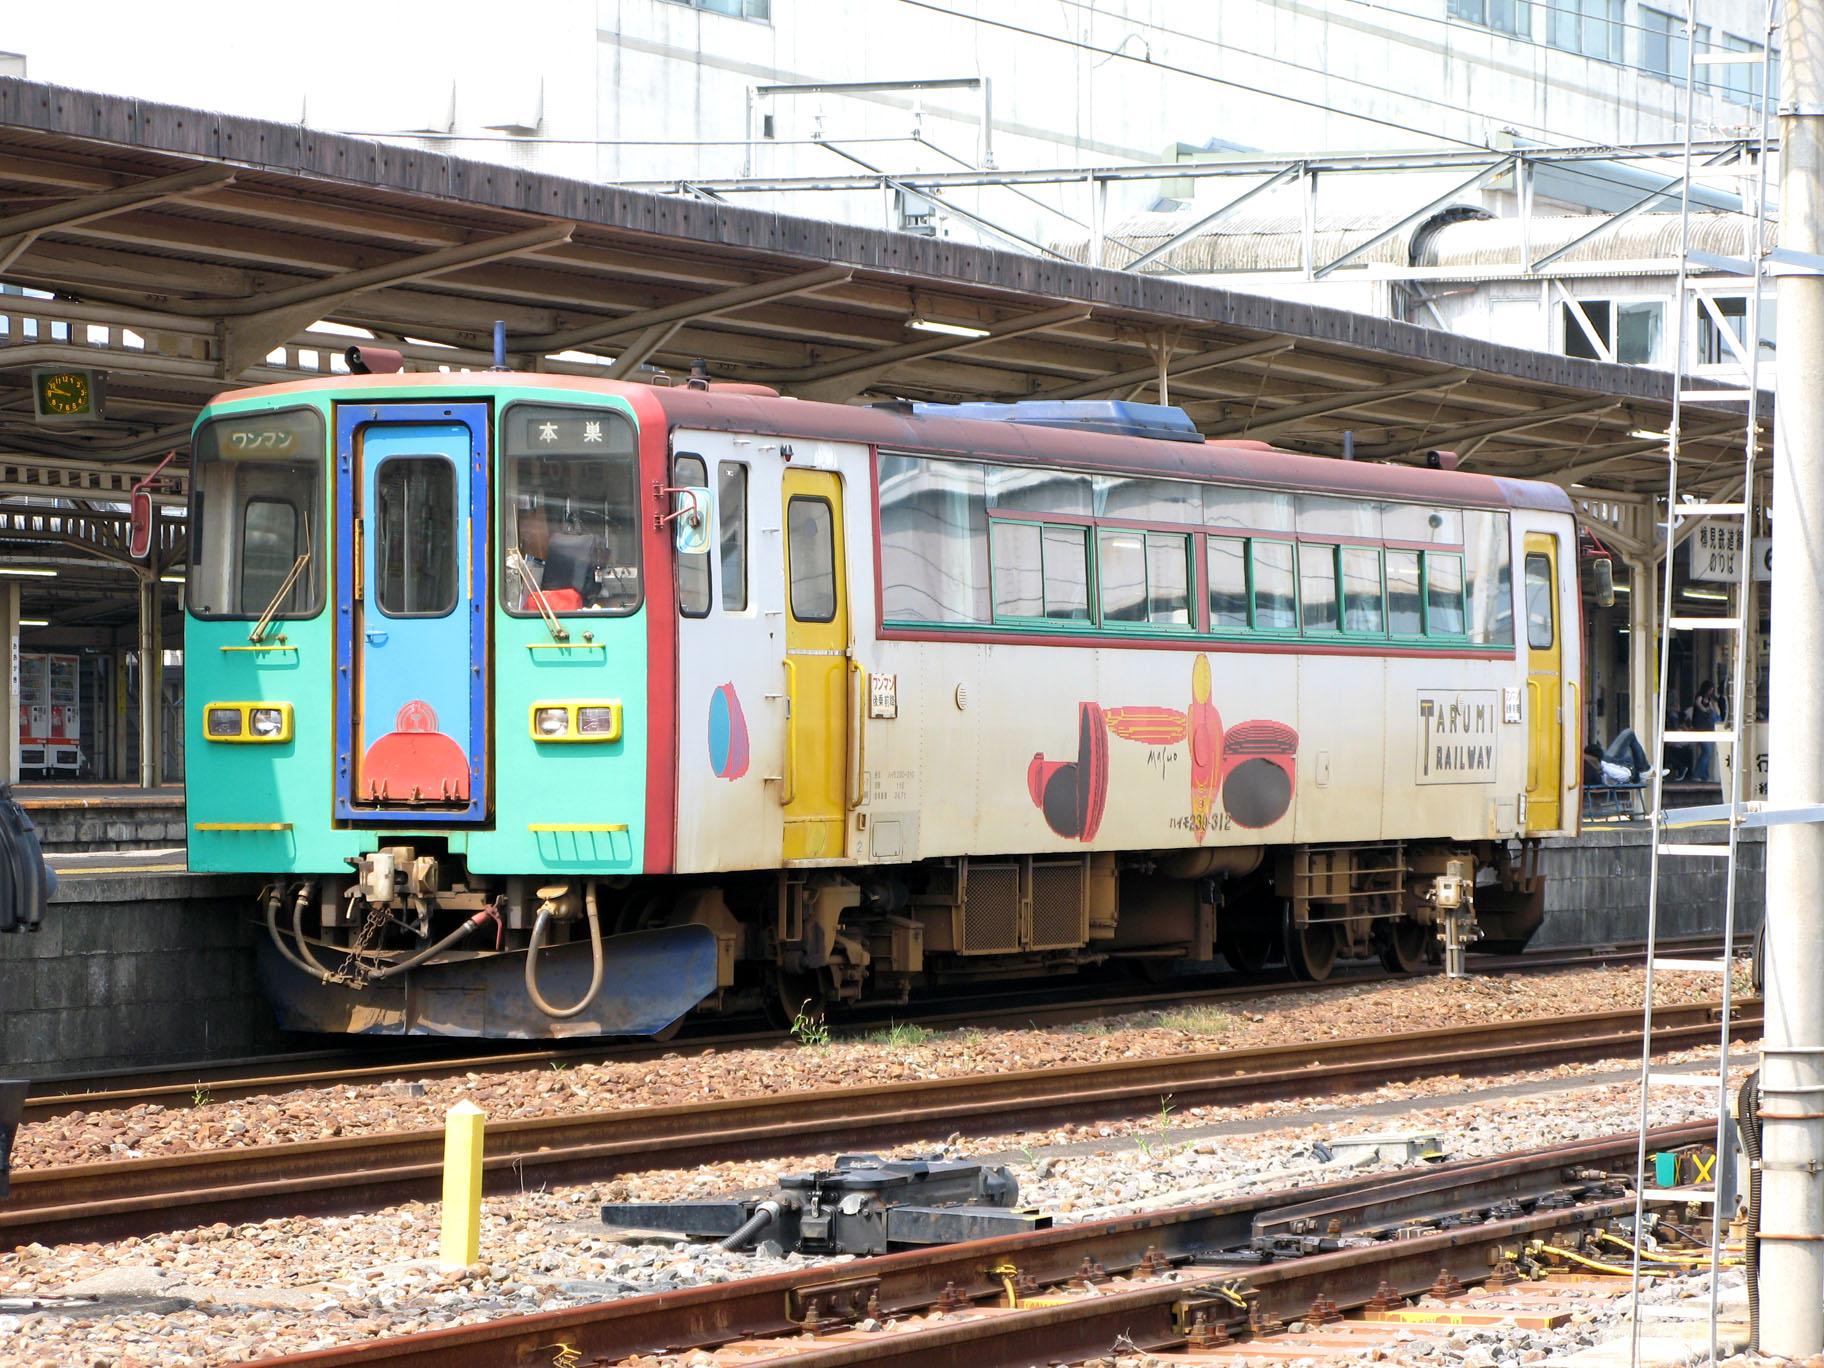 Image of Masuo Ikeda from Wikidata